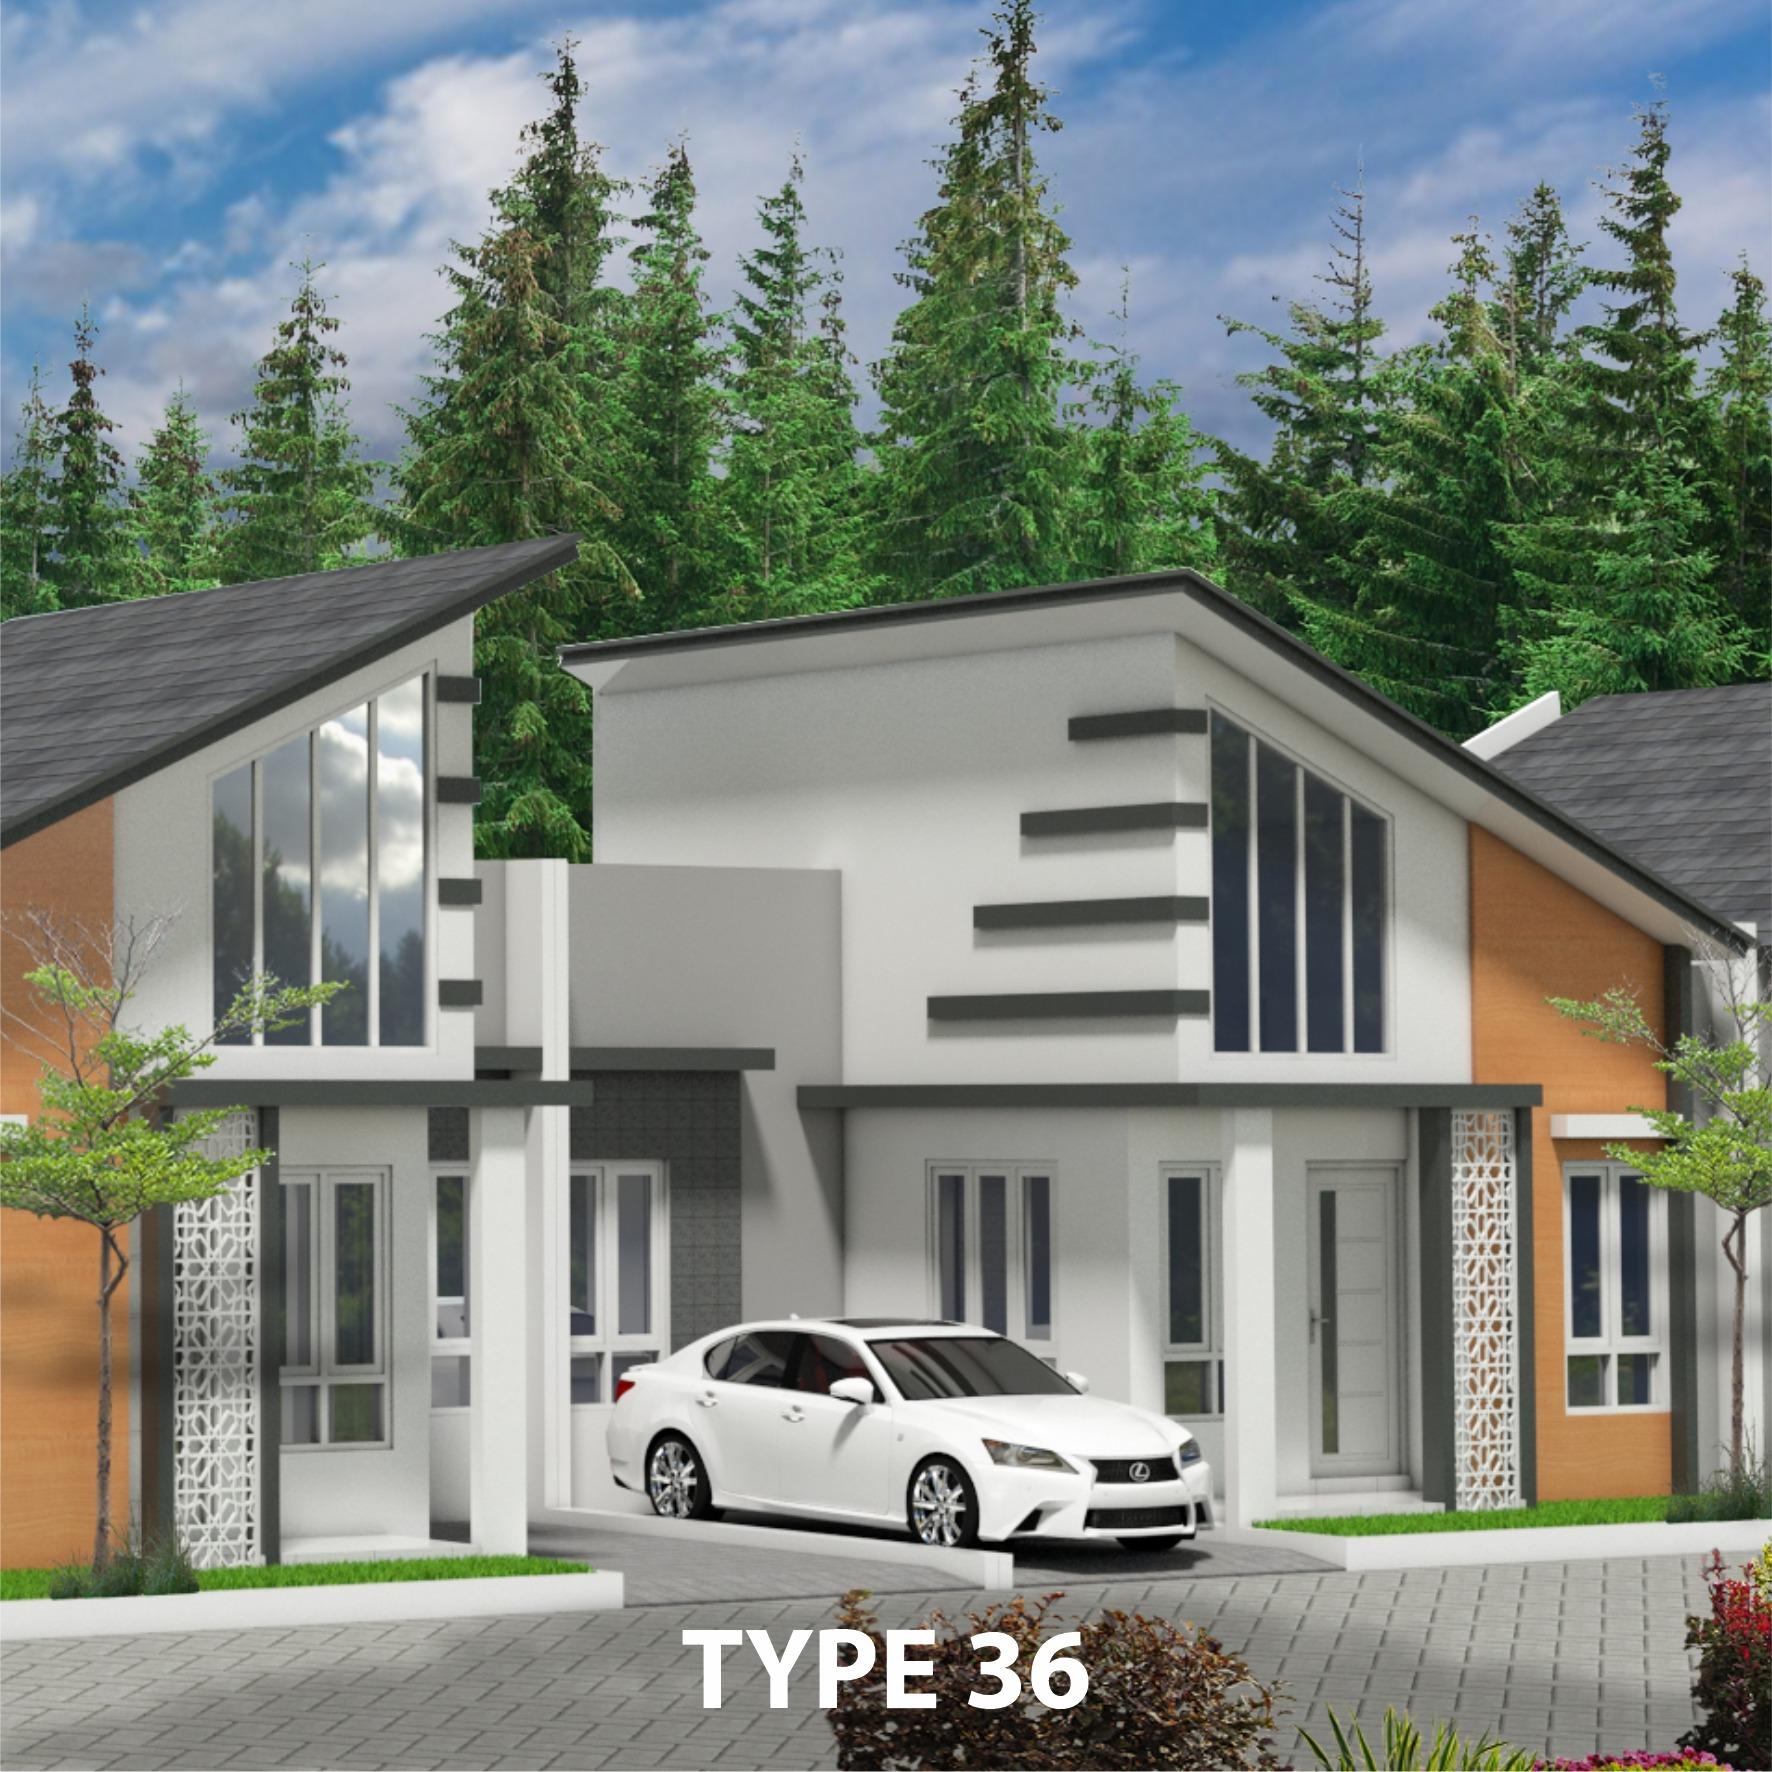 Rumah Dijual Di Malang Harga di Bawah 300 juta